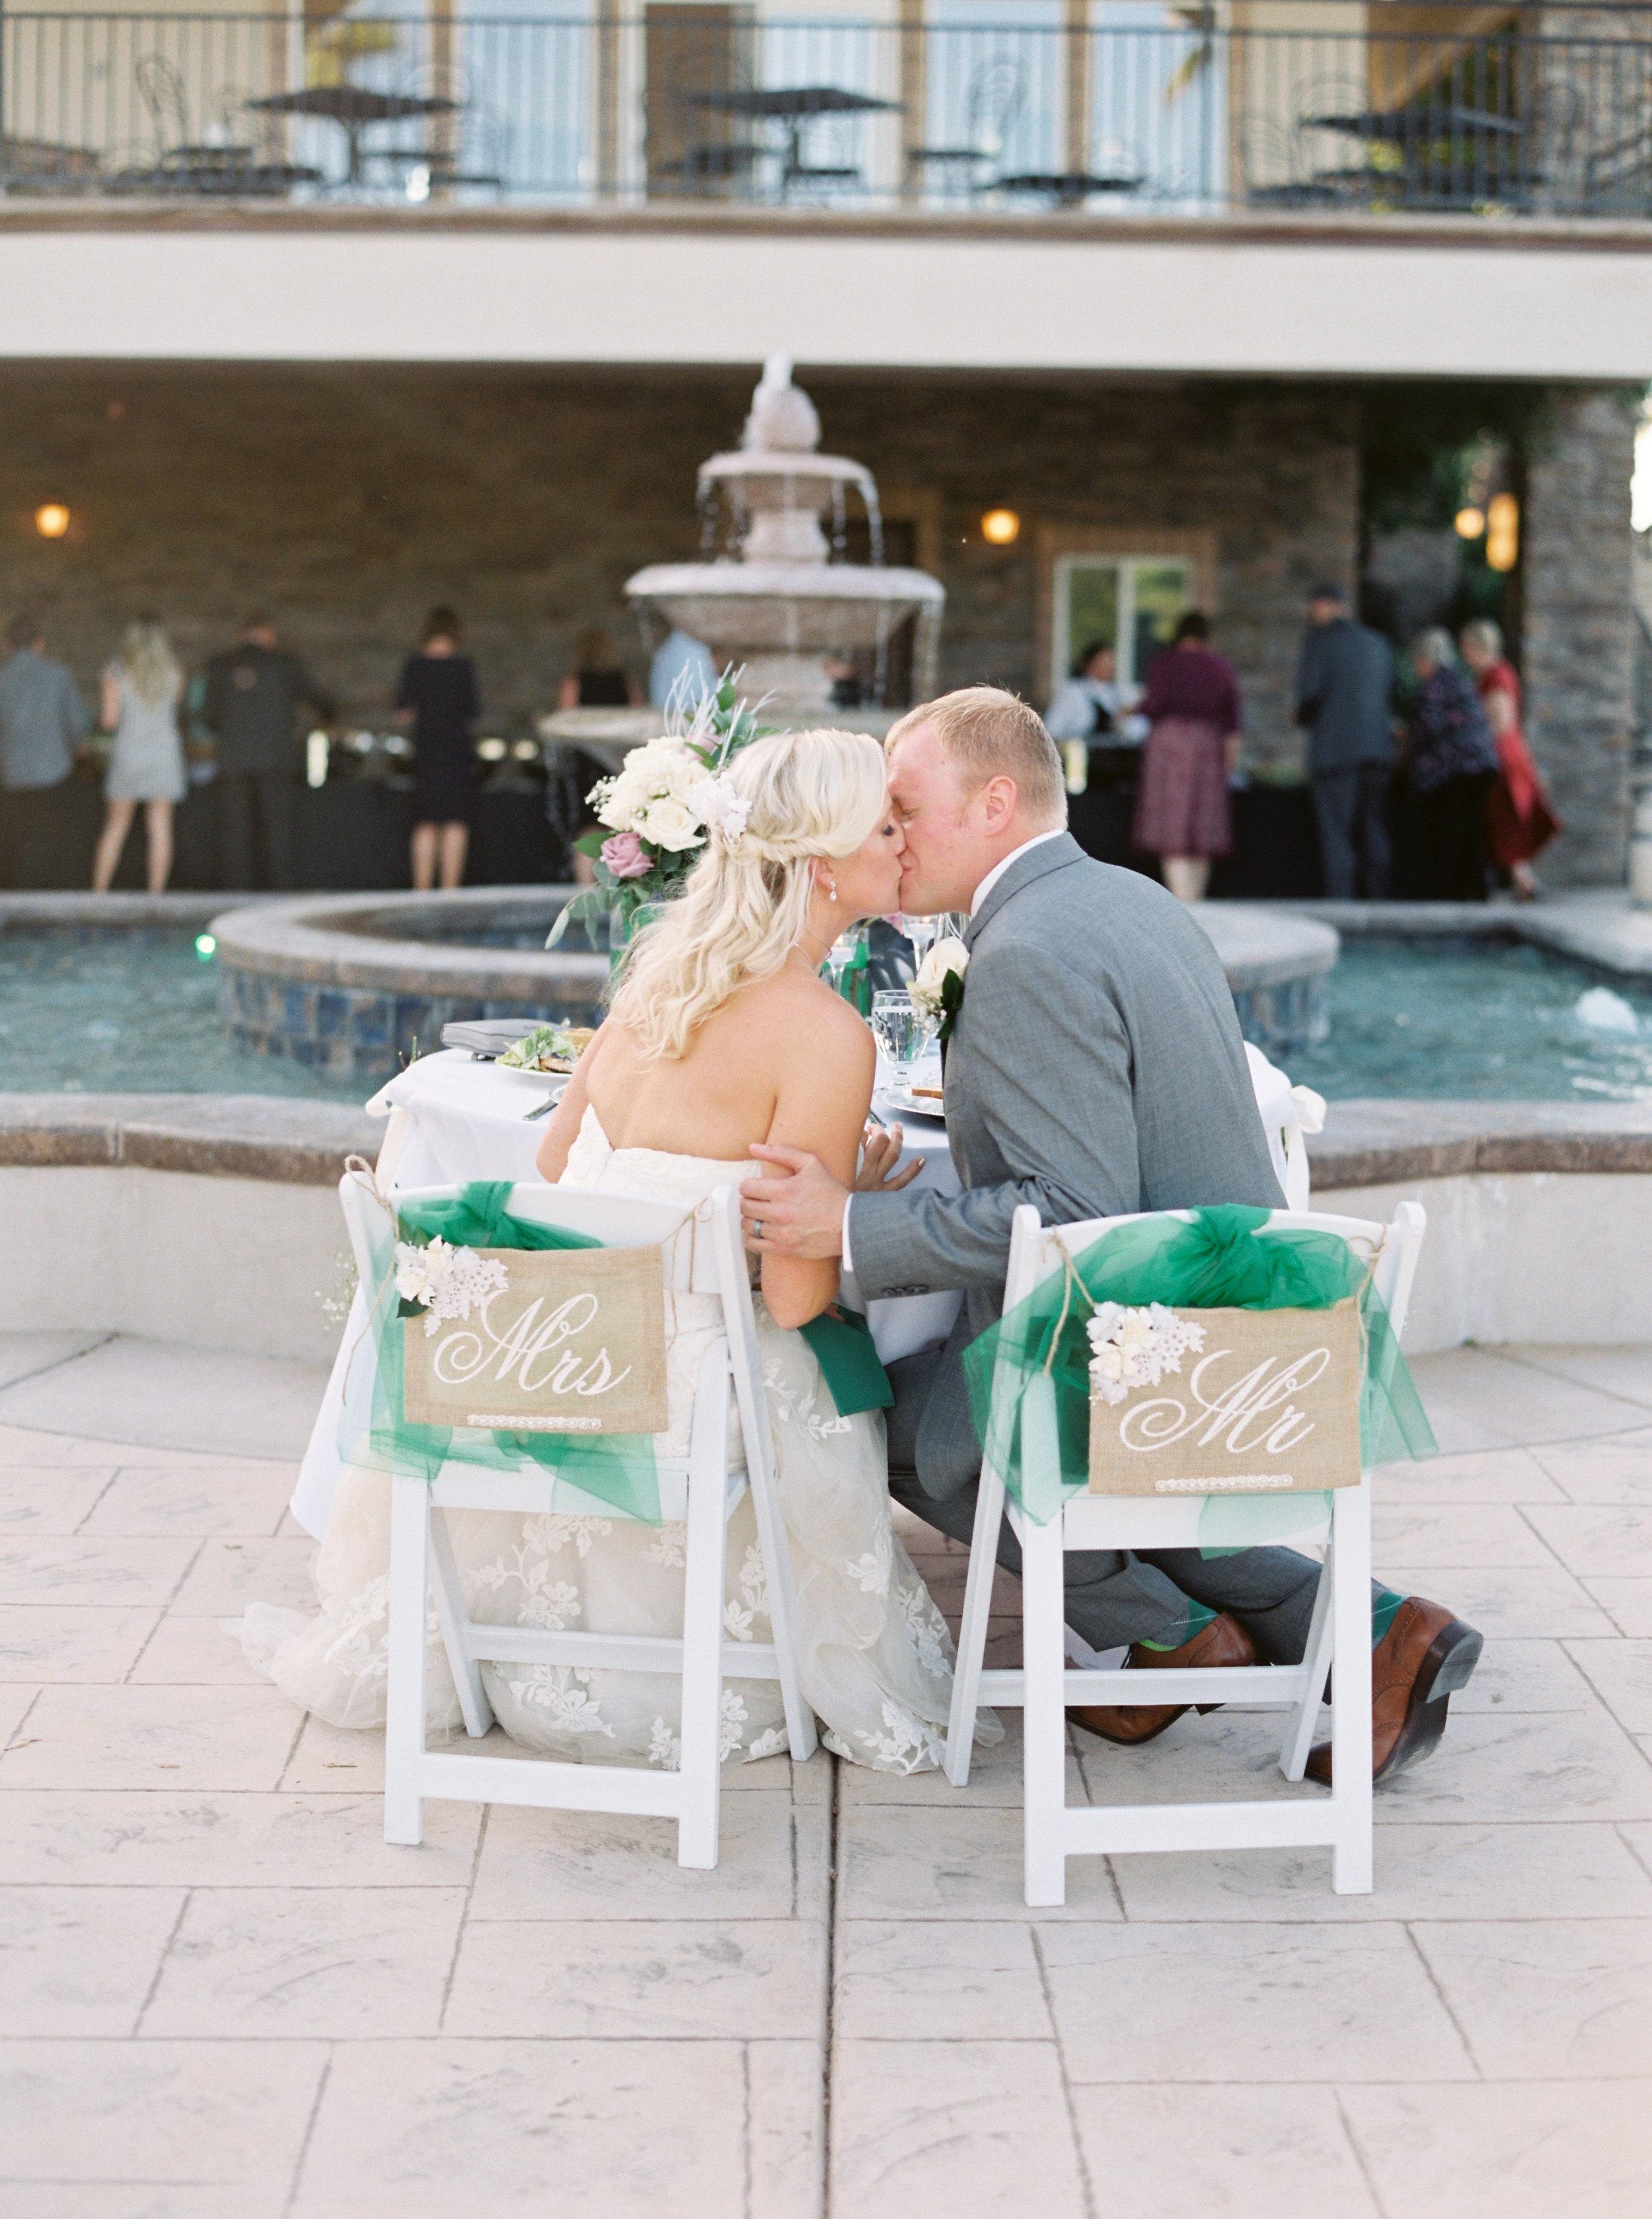 wolfe-heights-event-center-wedding-sacramento-california-wedding-74.jpg